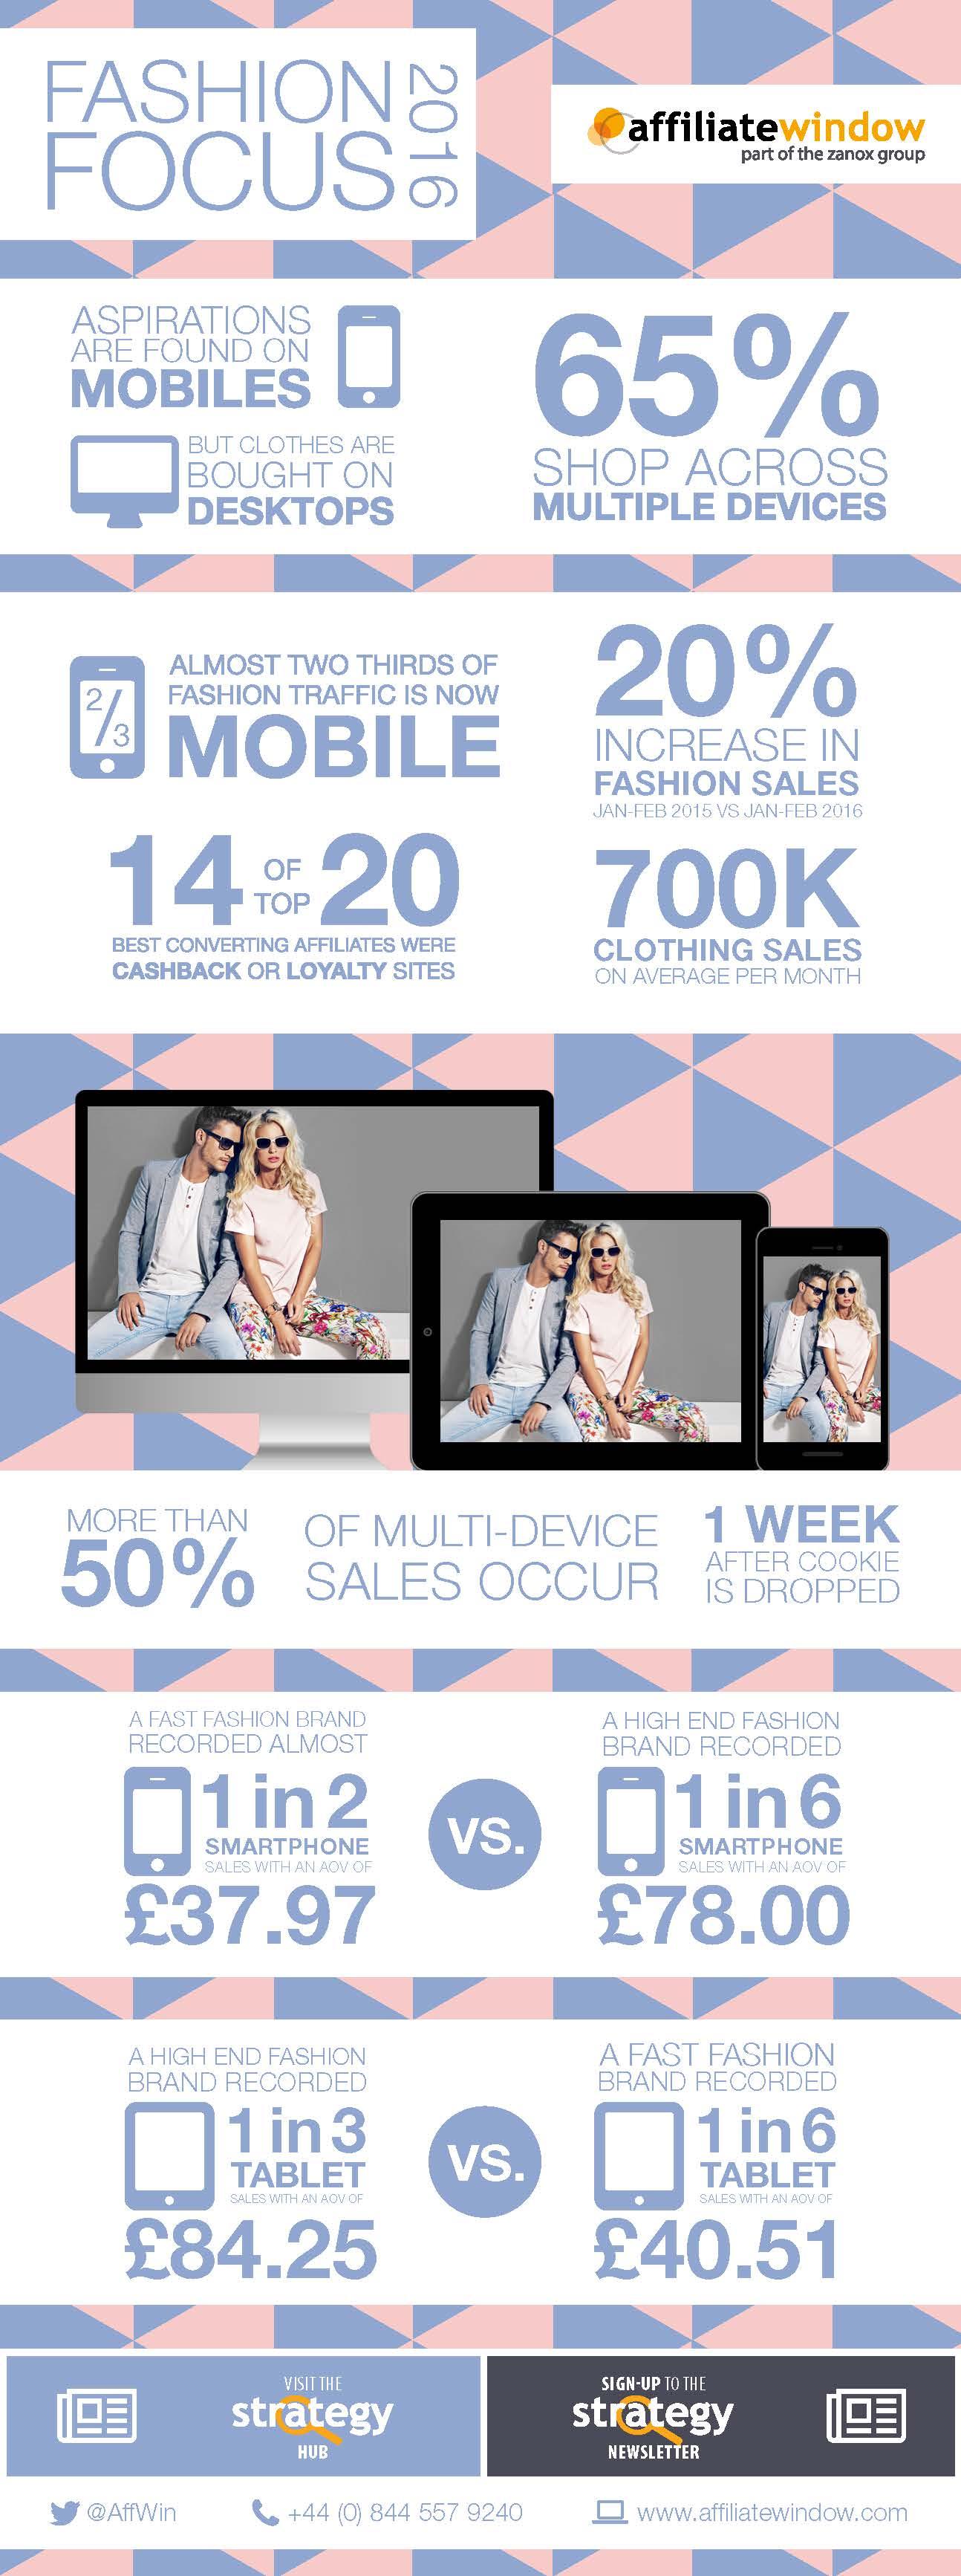 Fashion-Focus-Infographic.jpg